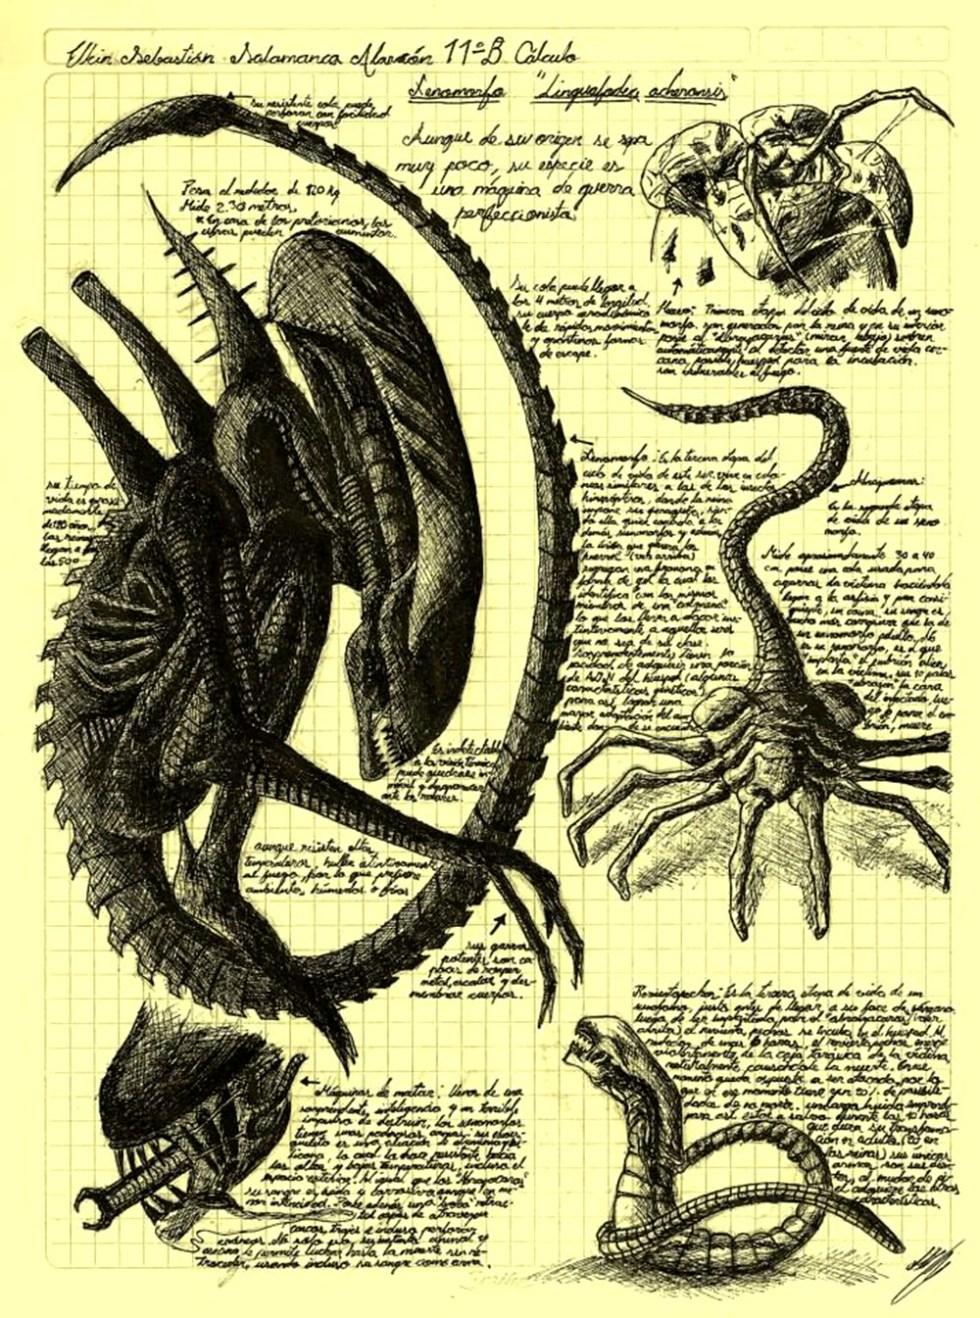 evolucion-alien-cuaderno-secreto-darwin